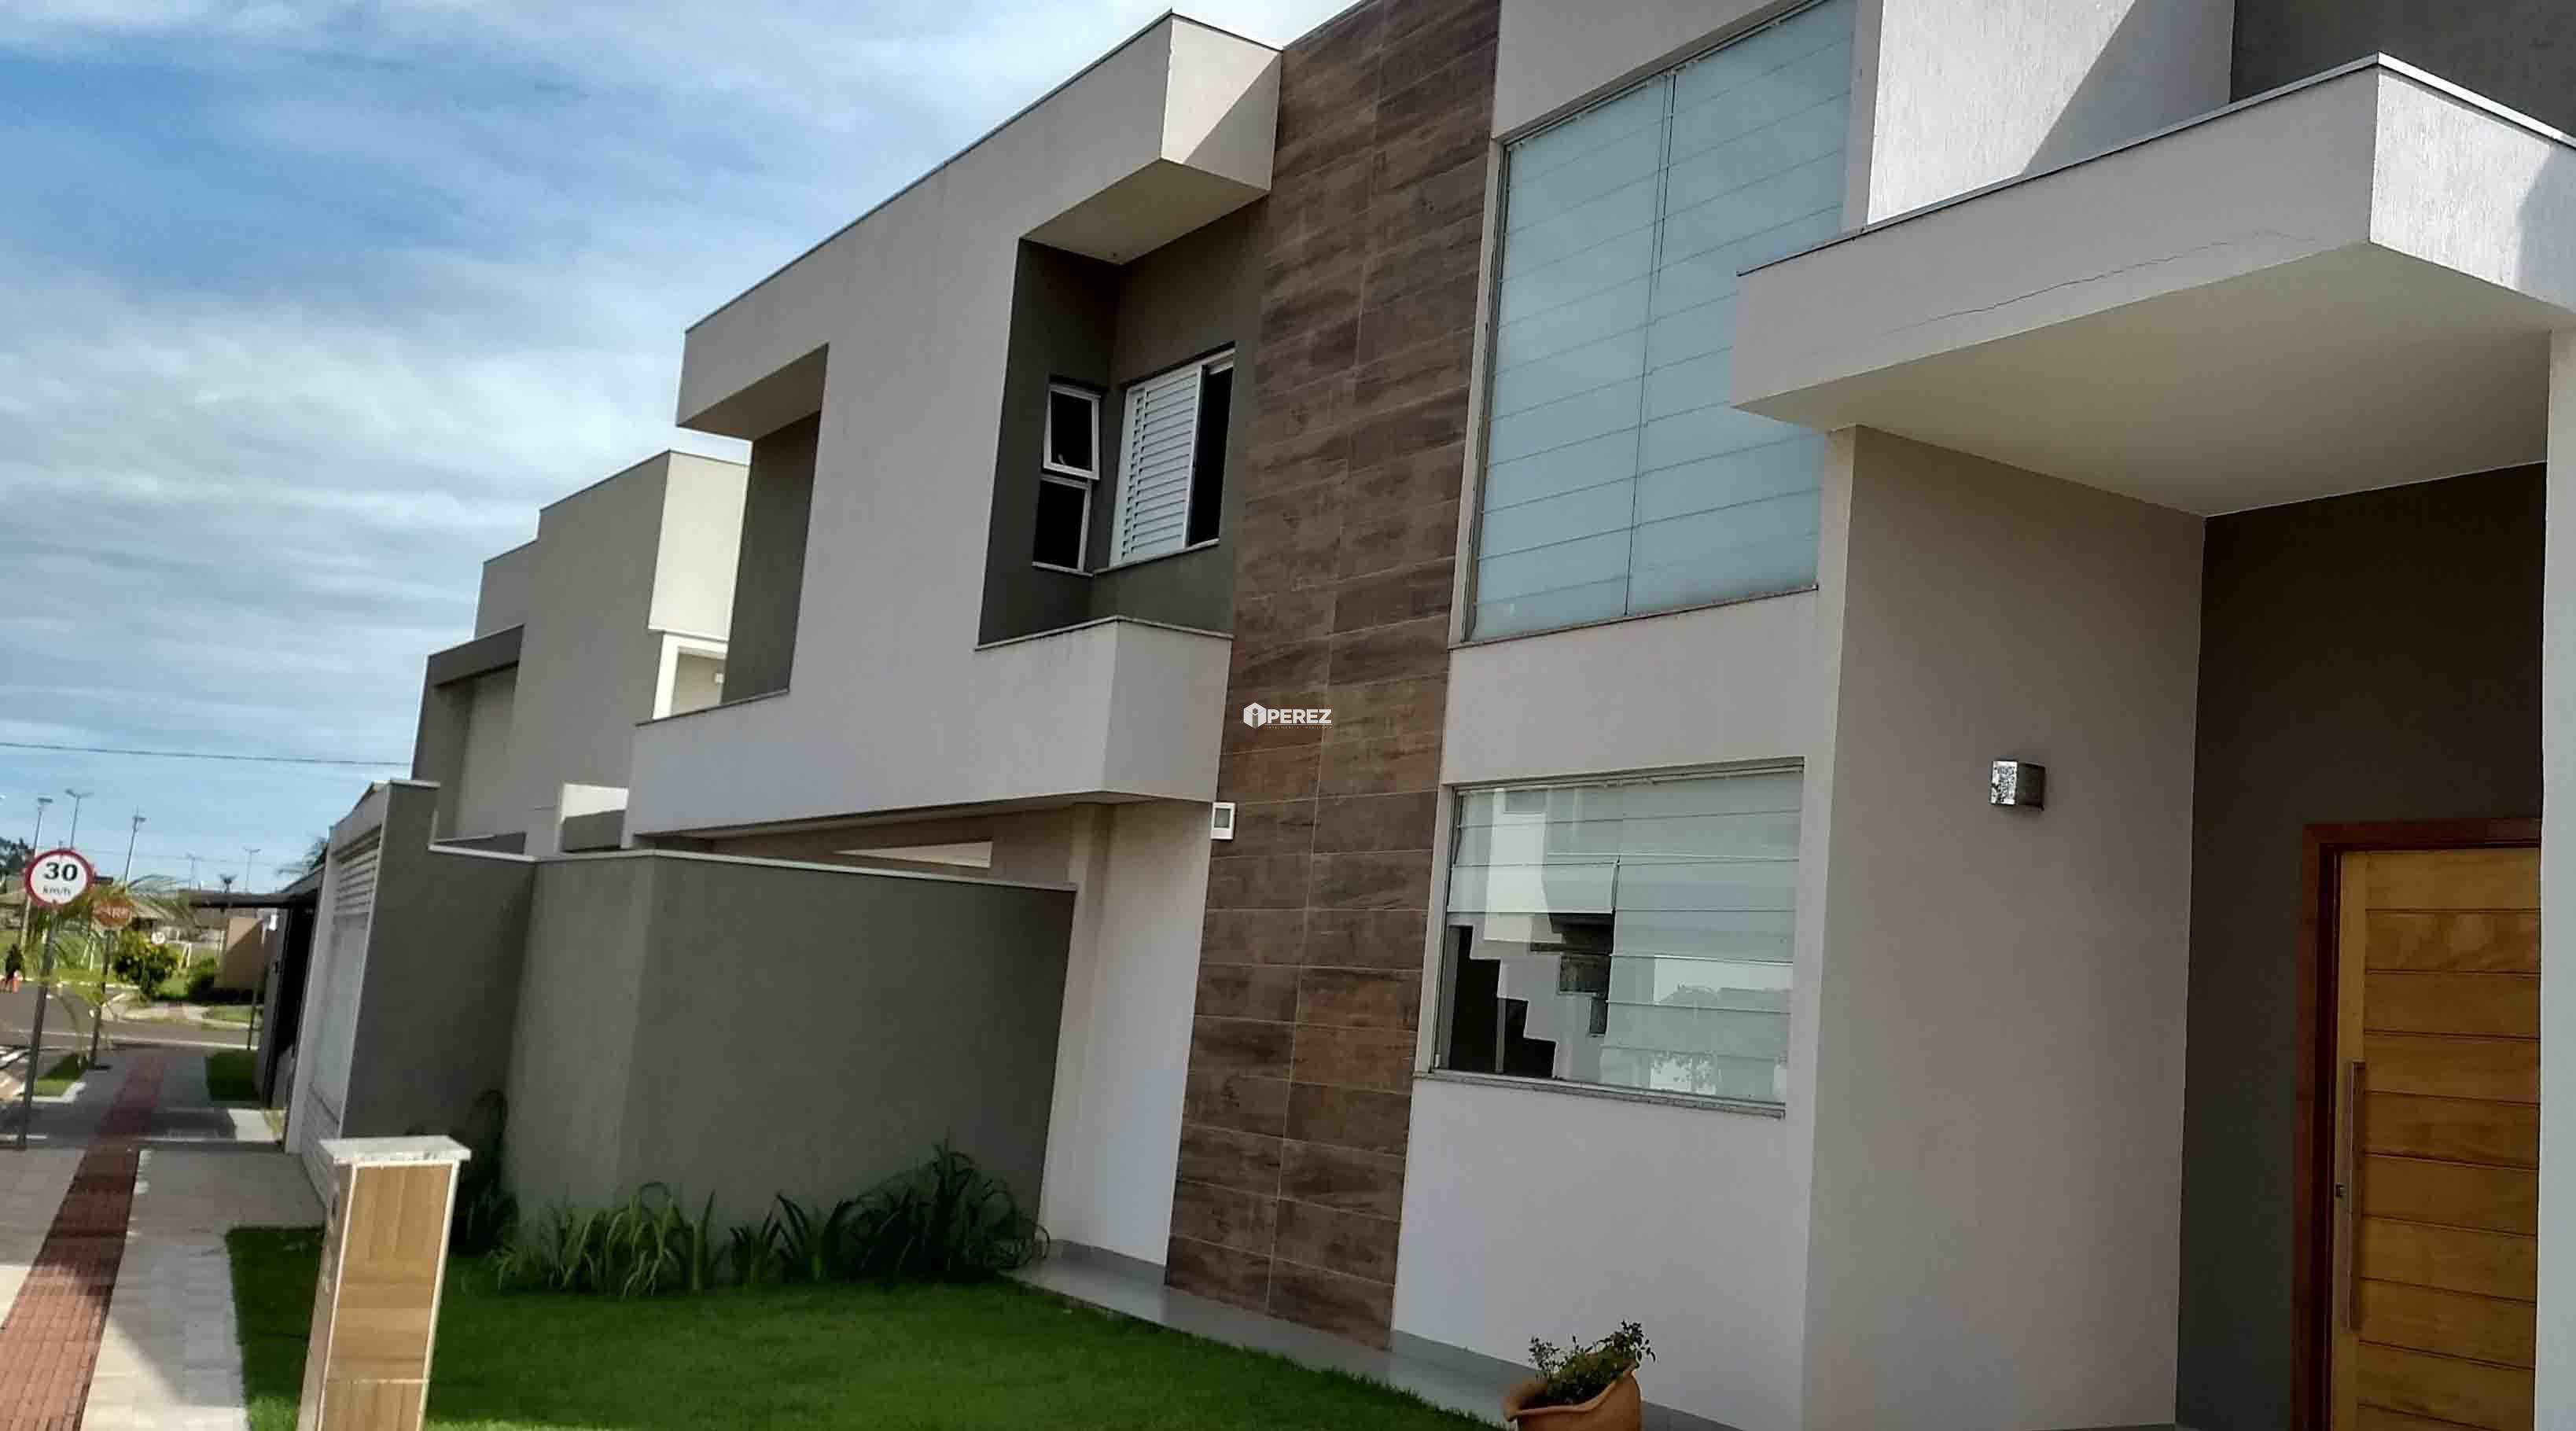 venda-campo-grande-ms-sobradocondominio-bascuare-residencial-damha-iii-perez-imoveis